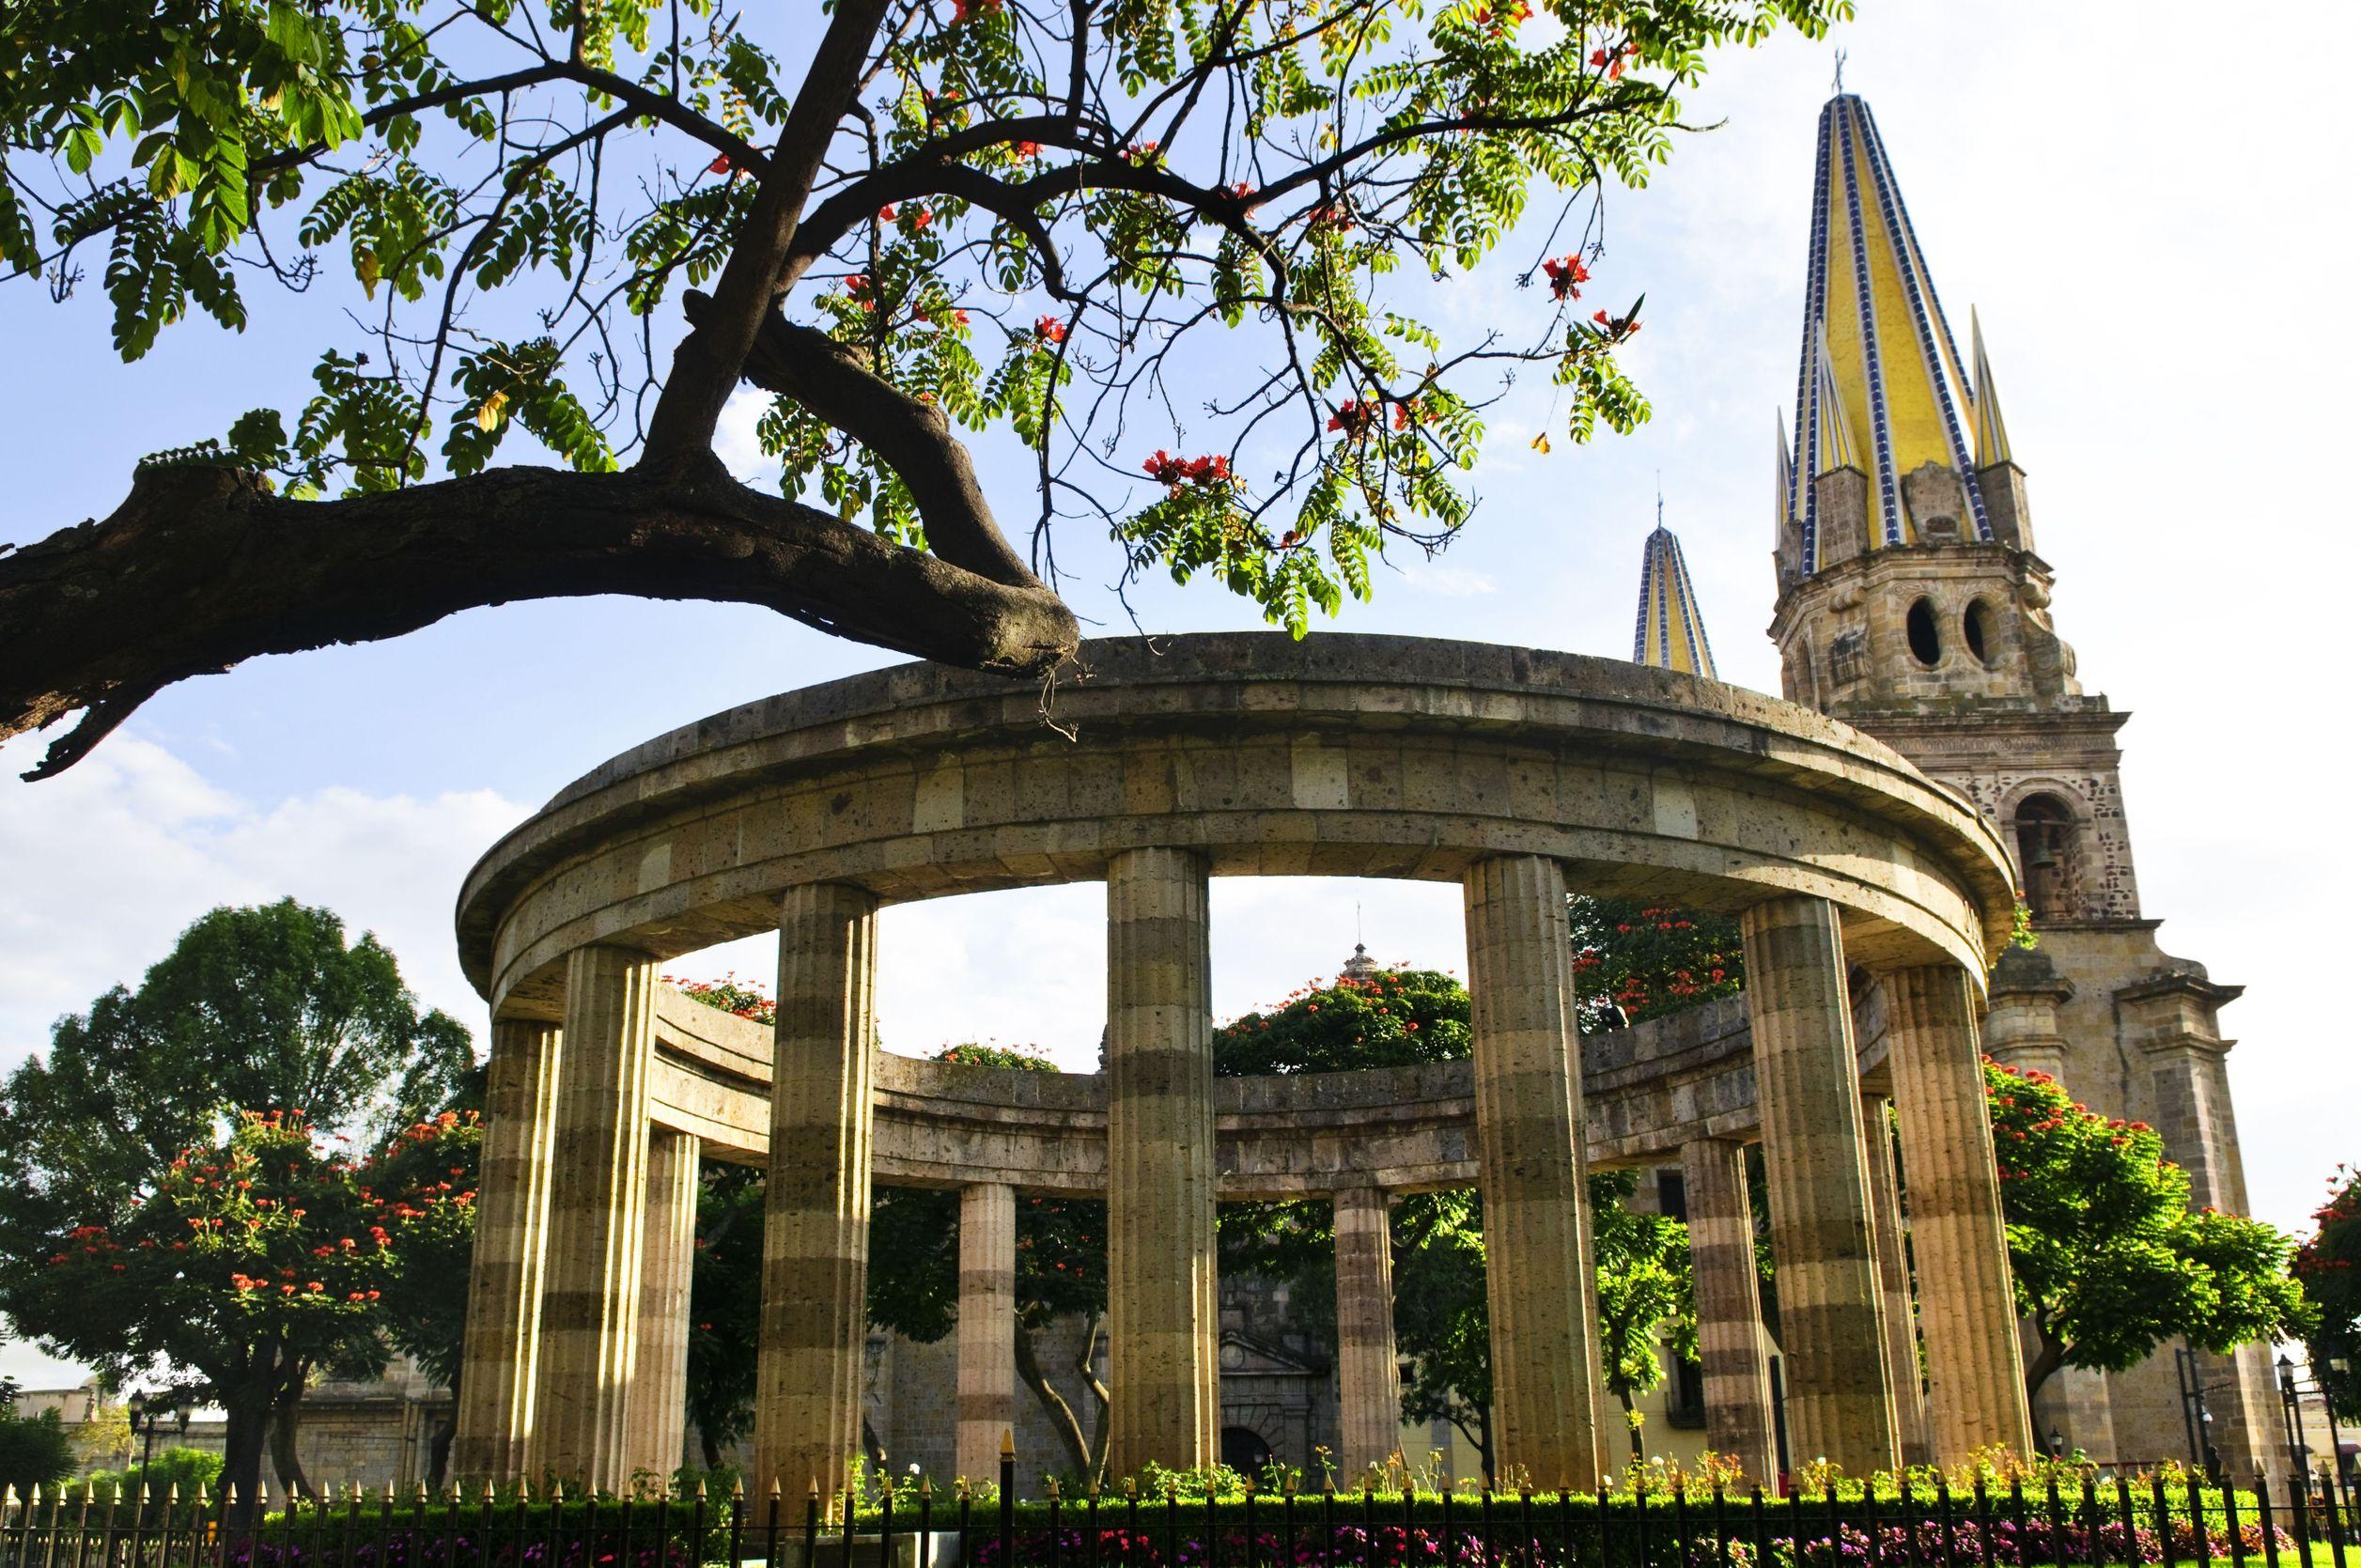 Guadalajara Rotonda-de-los-Jalisciences-Ilustres-and-Cathedral